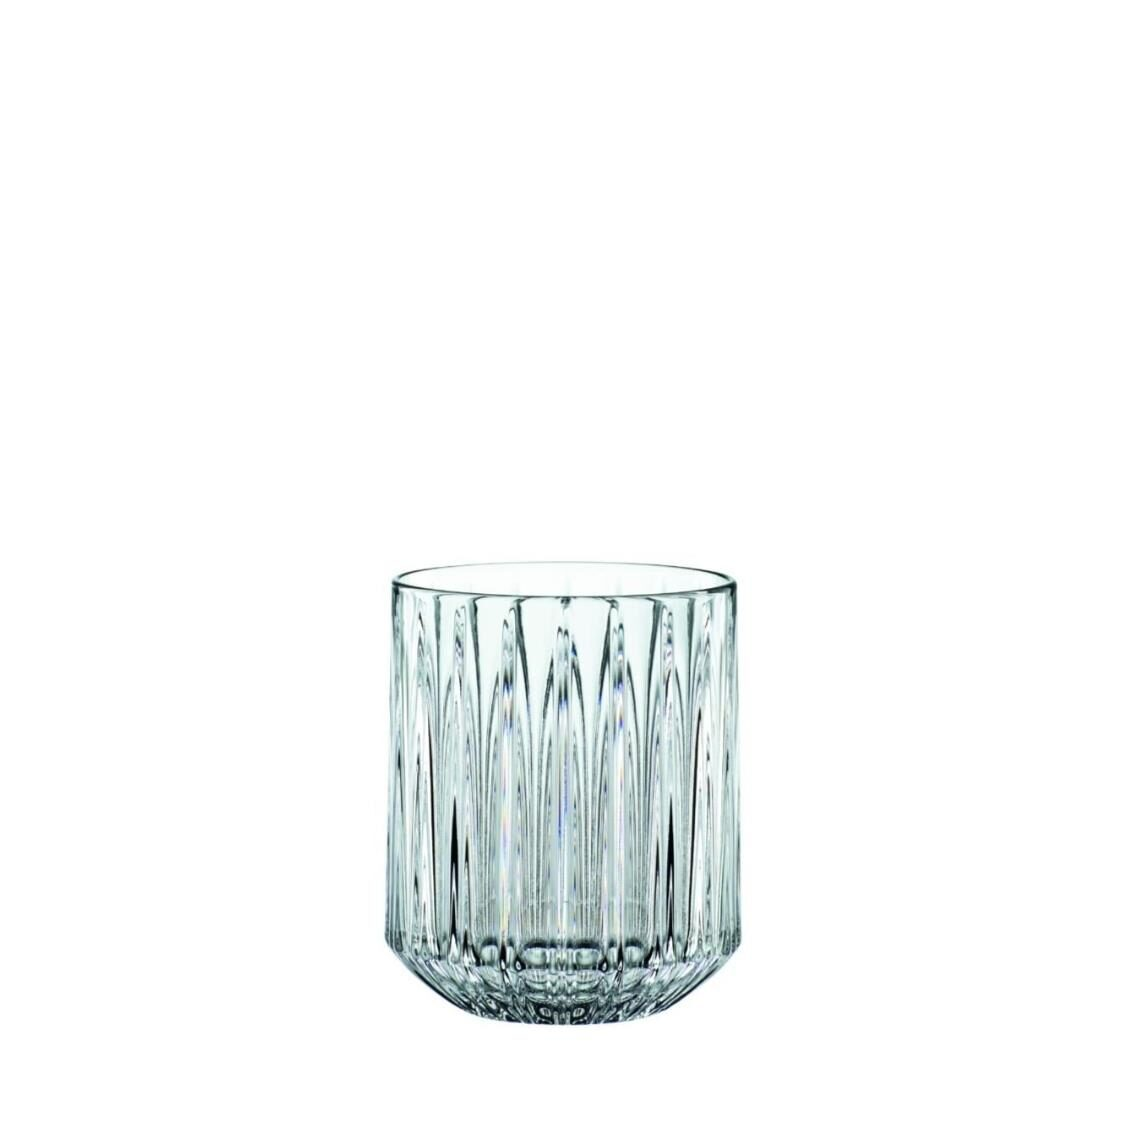 Nachtmann Lead Free Crystal Tumbler Set Of 4Pcs 305ml Jules R-101979